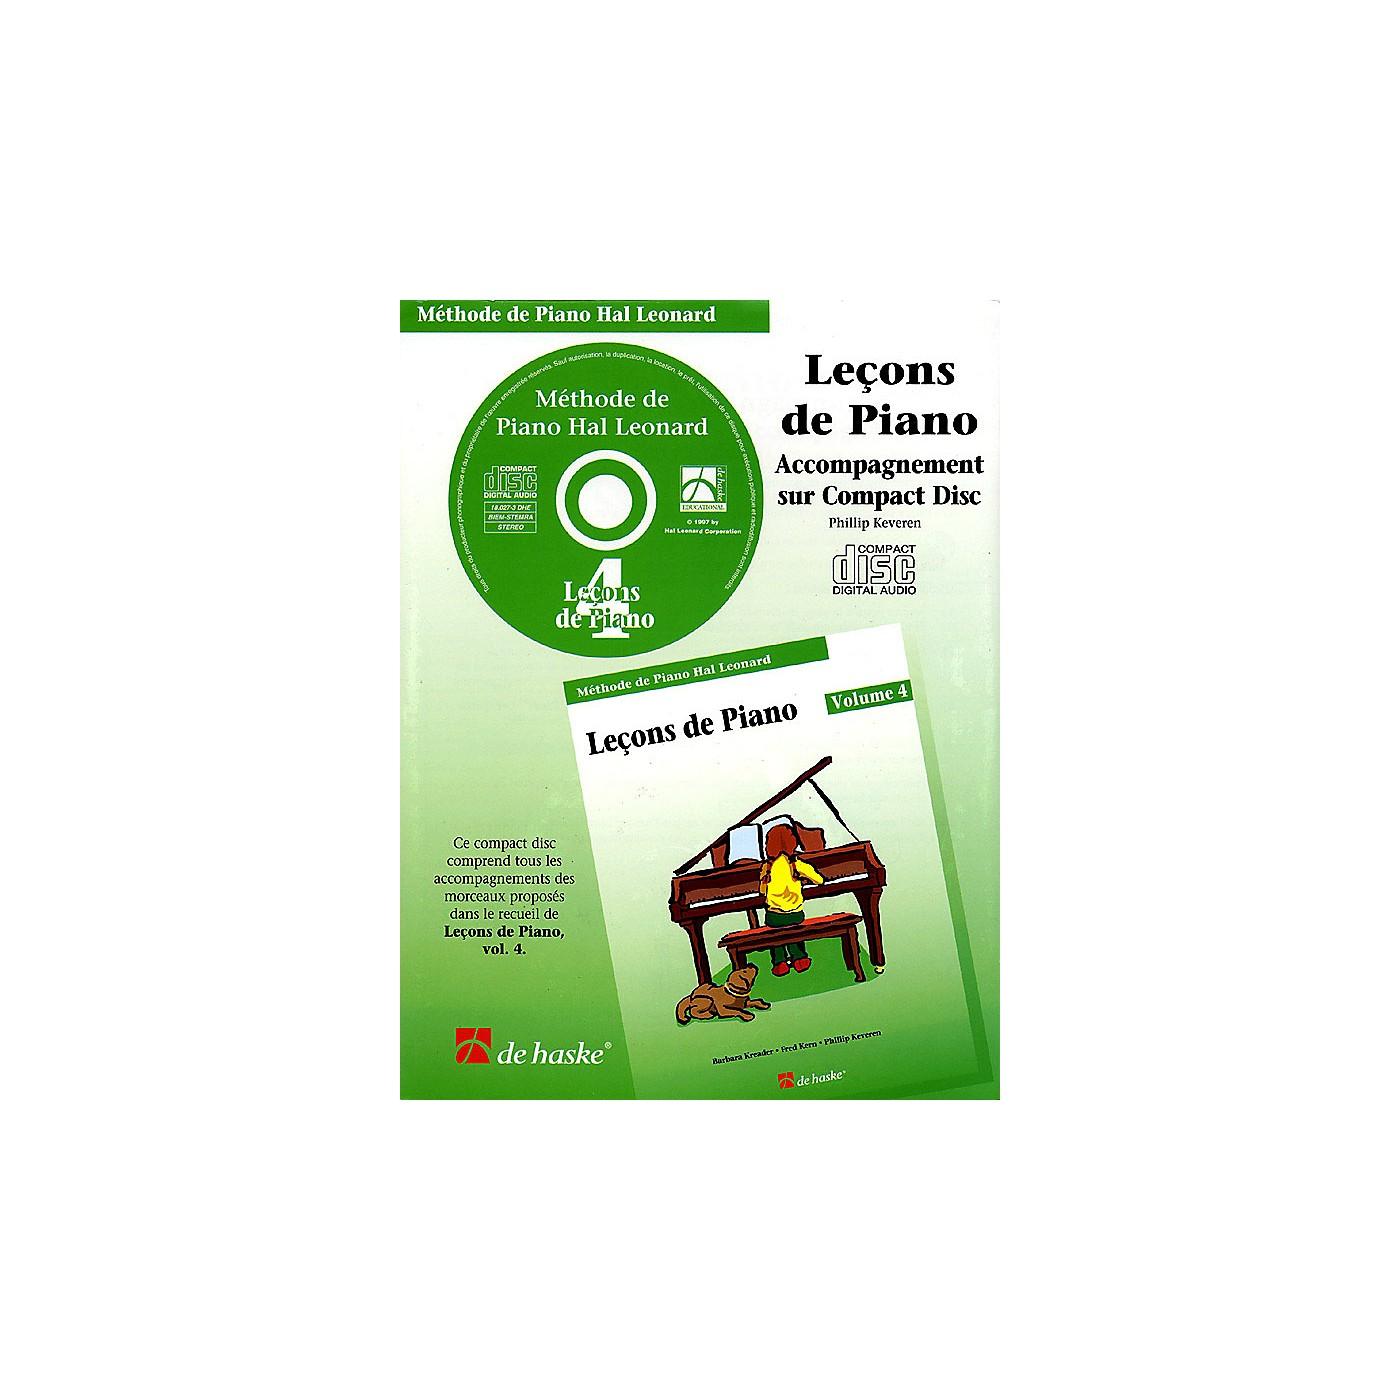 Hal Leonard Piano Lessons Book 4 - CD - French Edition Education Piano Lib French Ed Series CD thumbnail